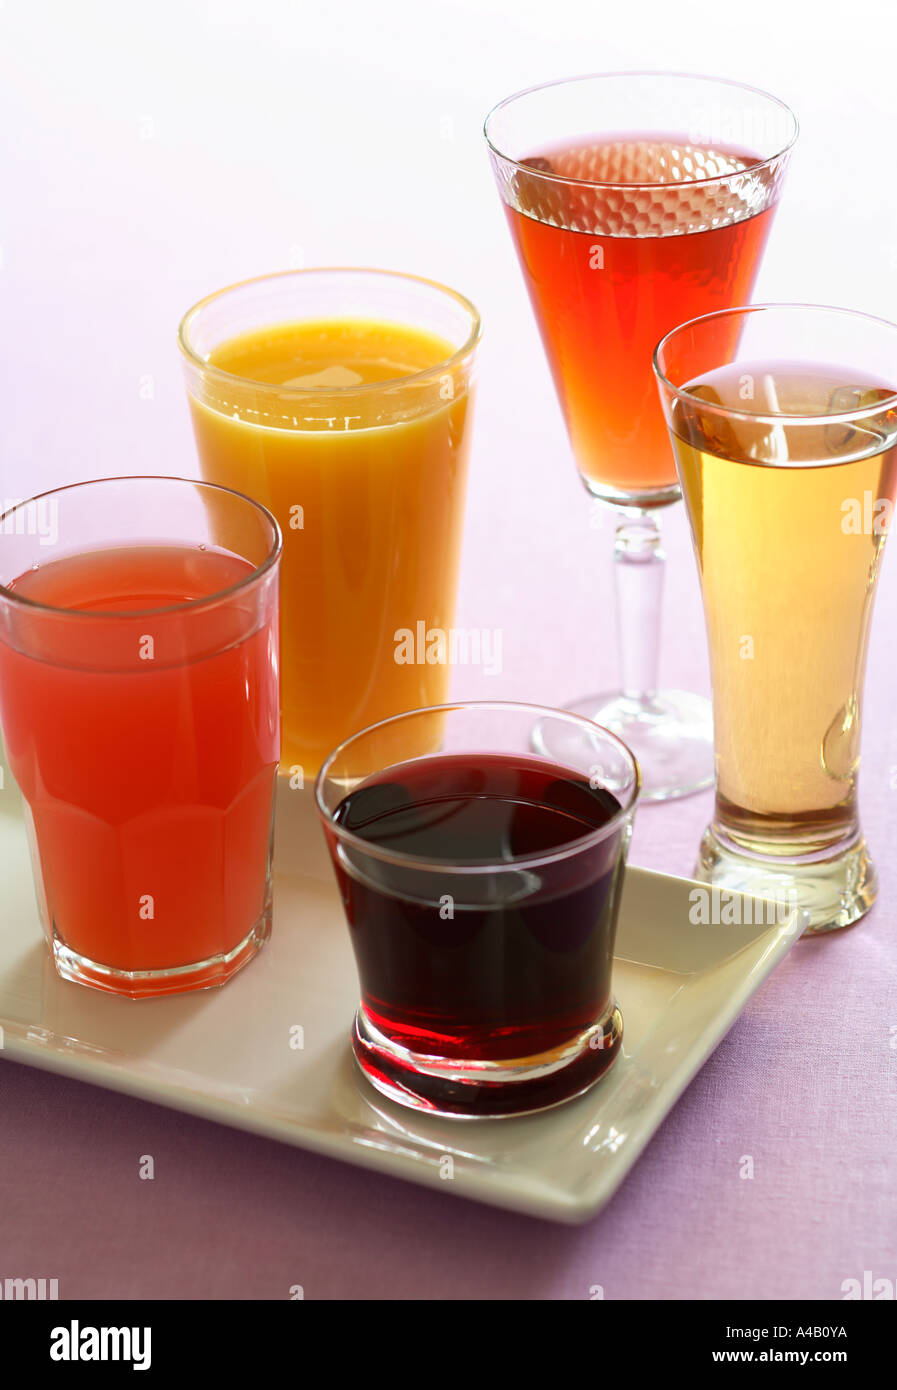 Assortment of Fresh Fruit Juices - Stock Image